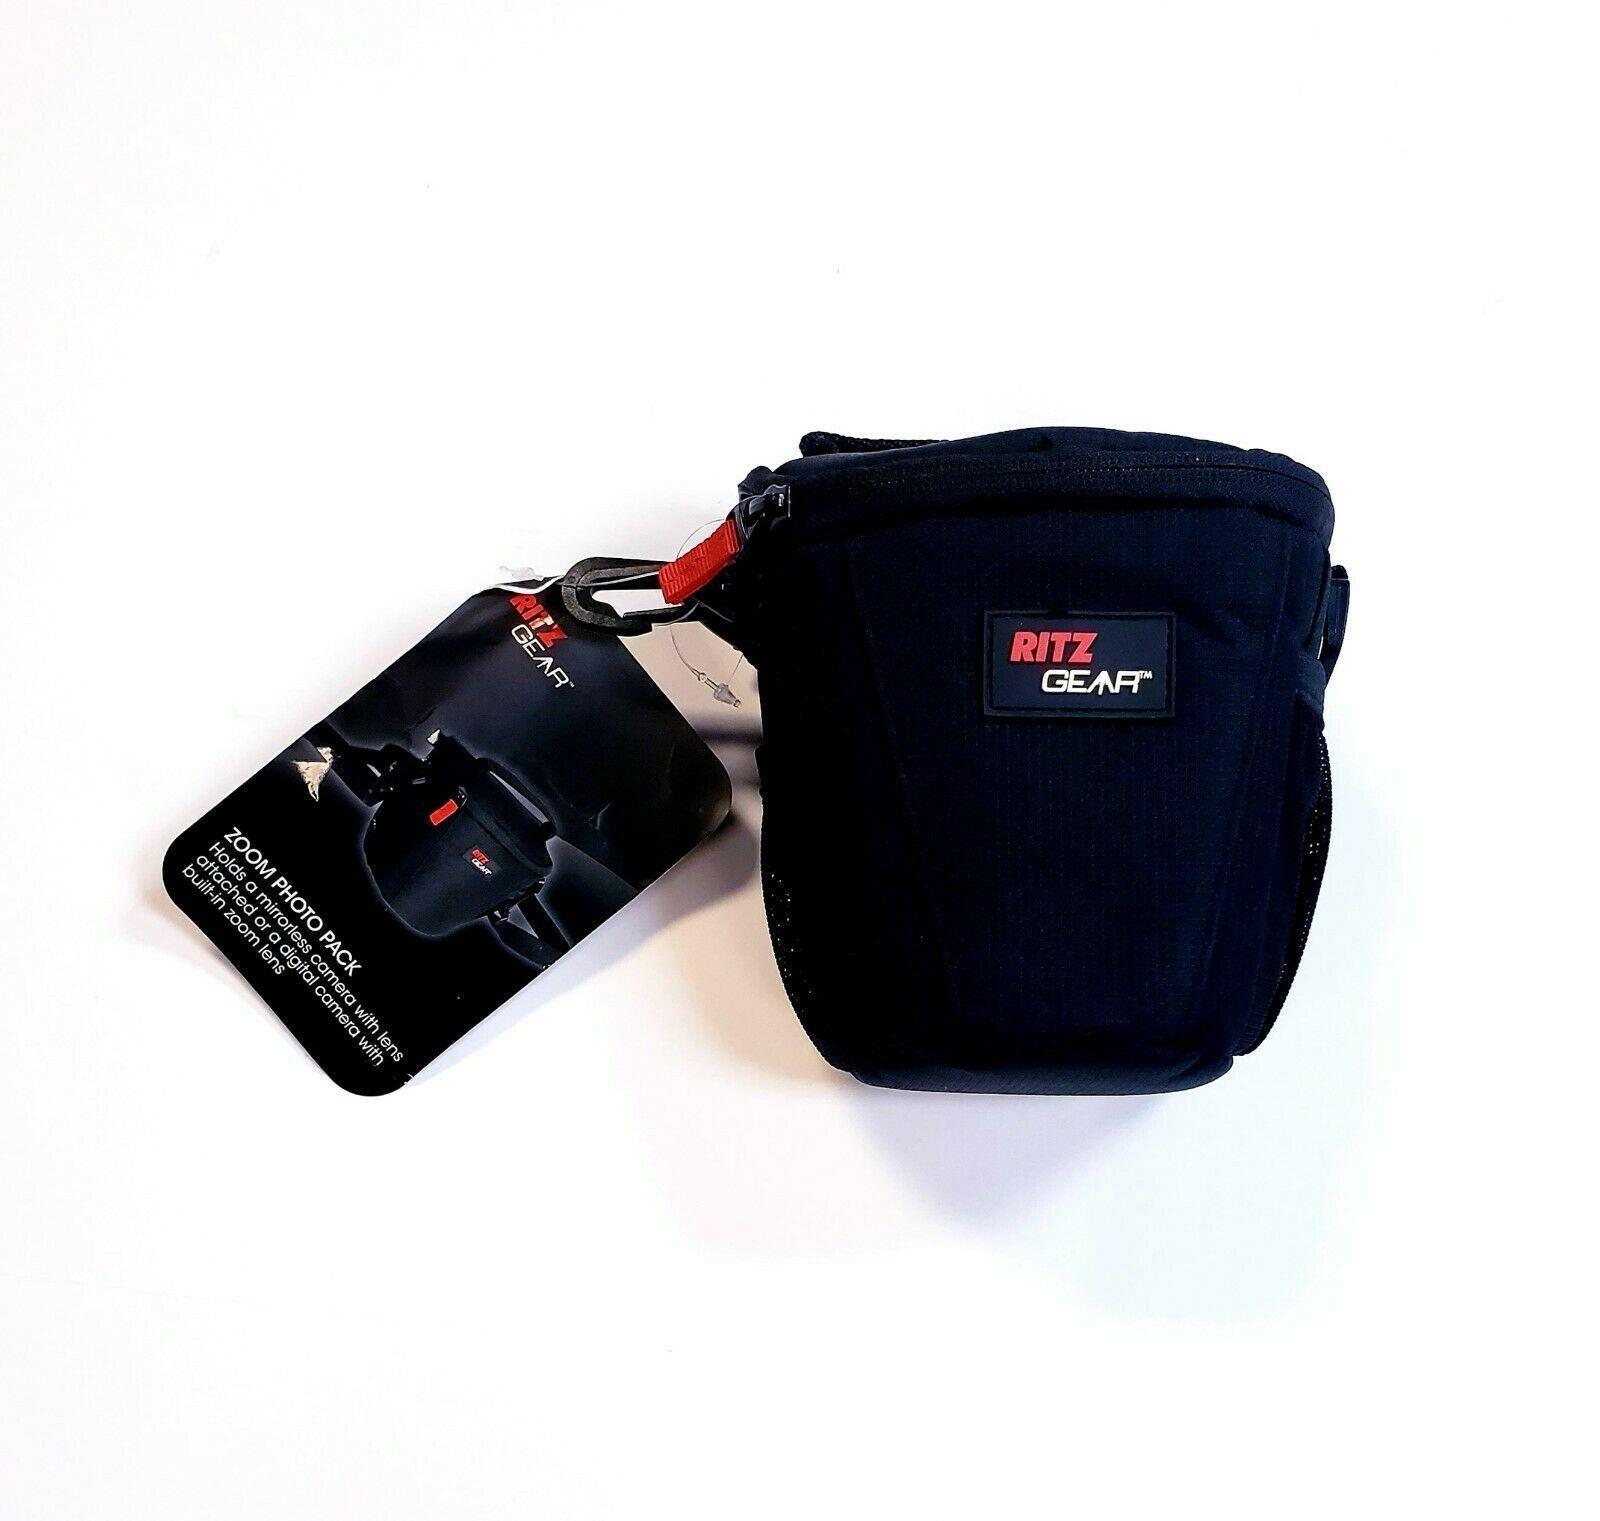 Ritz Gear Deluxe Zoom Photo Pack Foam Padded Camera Bag Mesh Side Pockets Black - $11.36